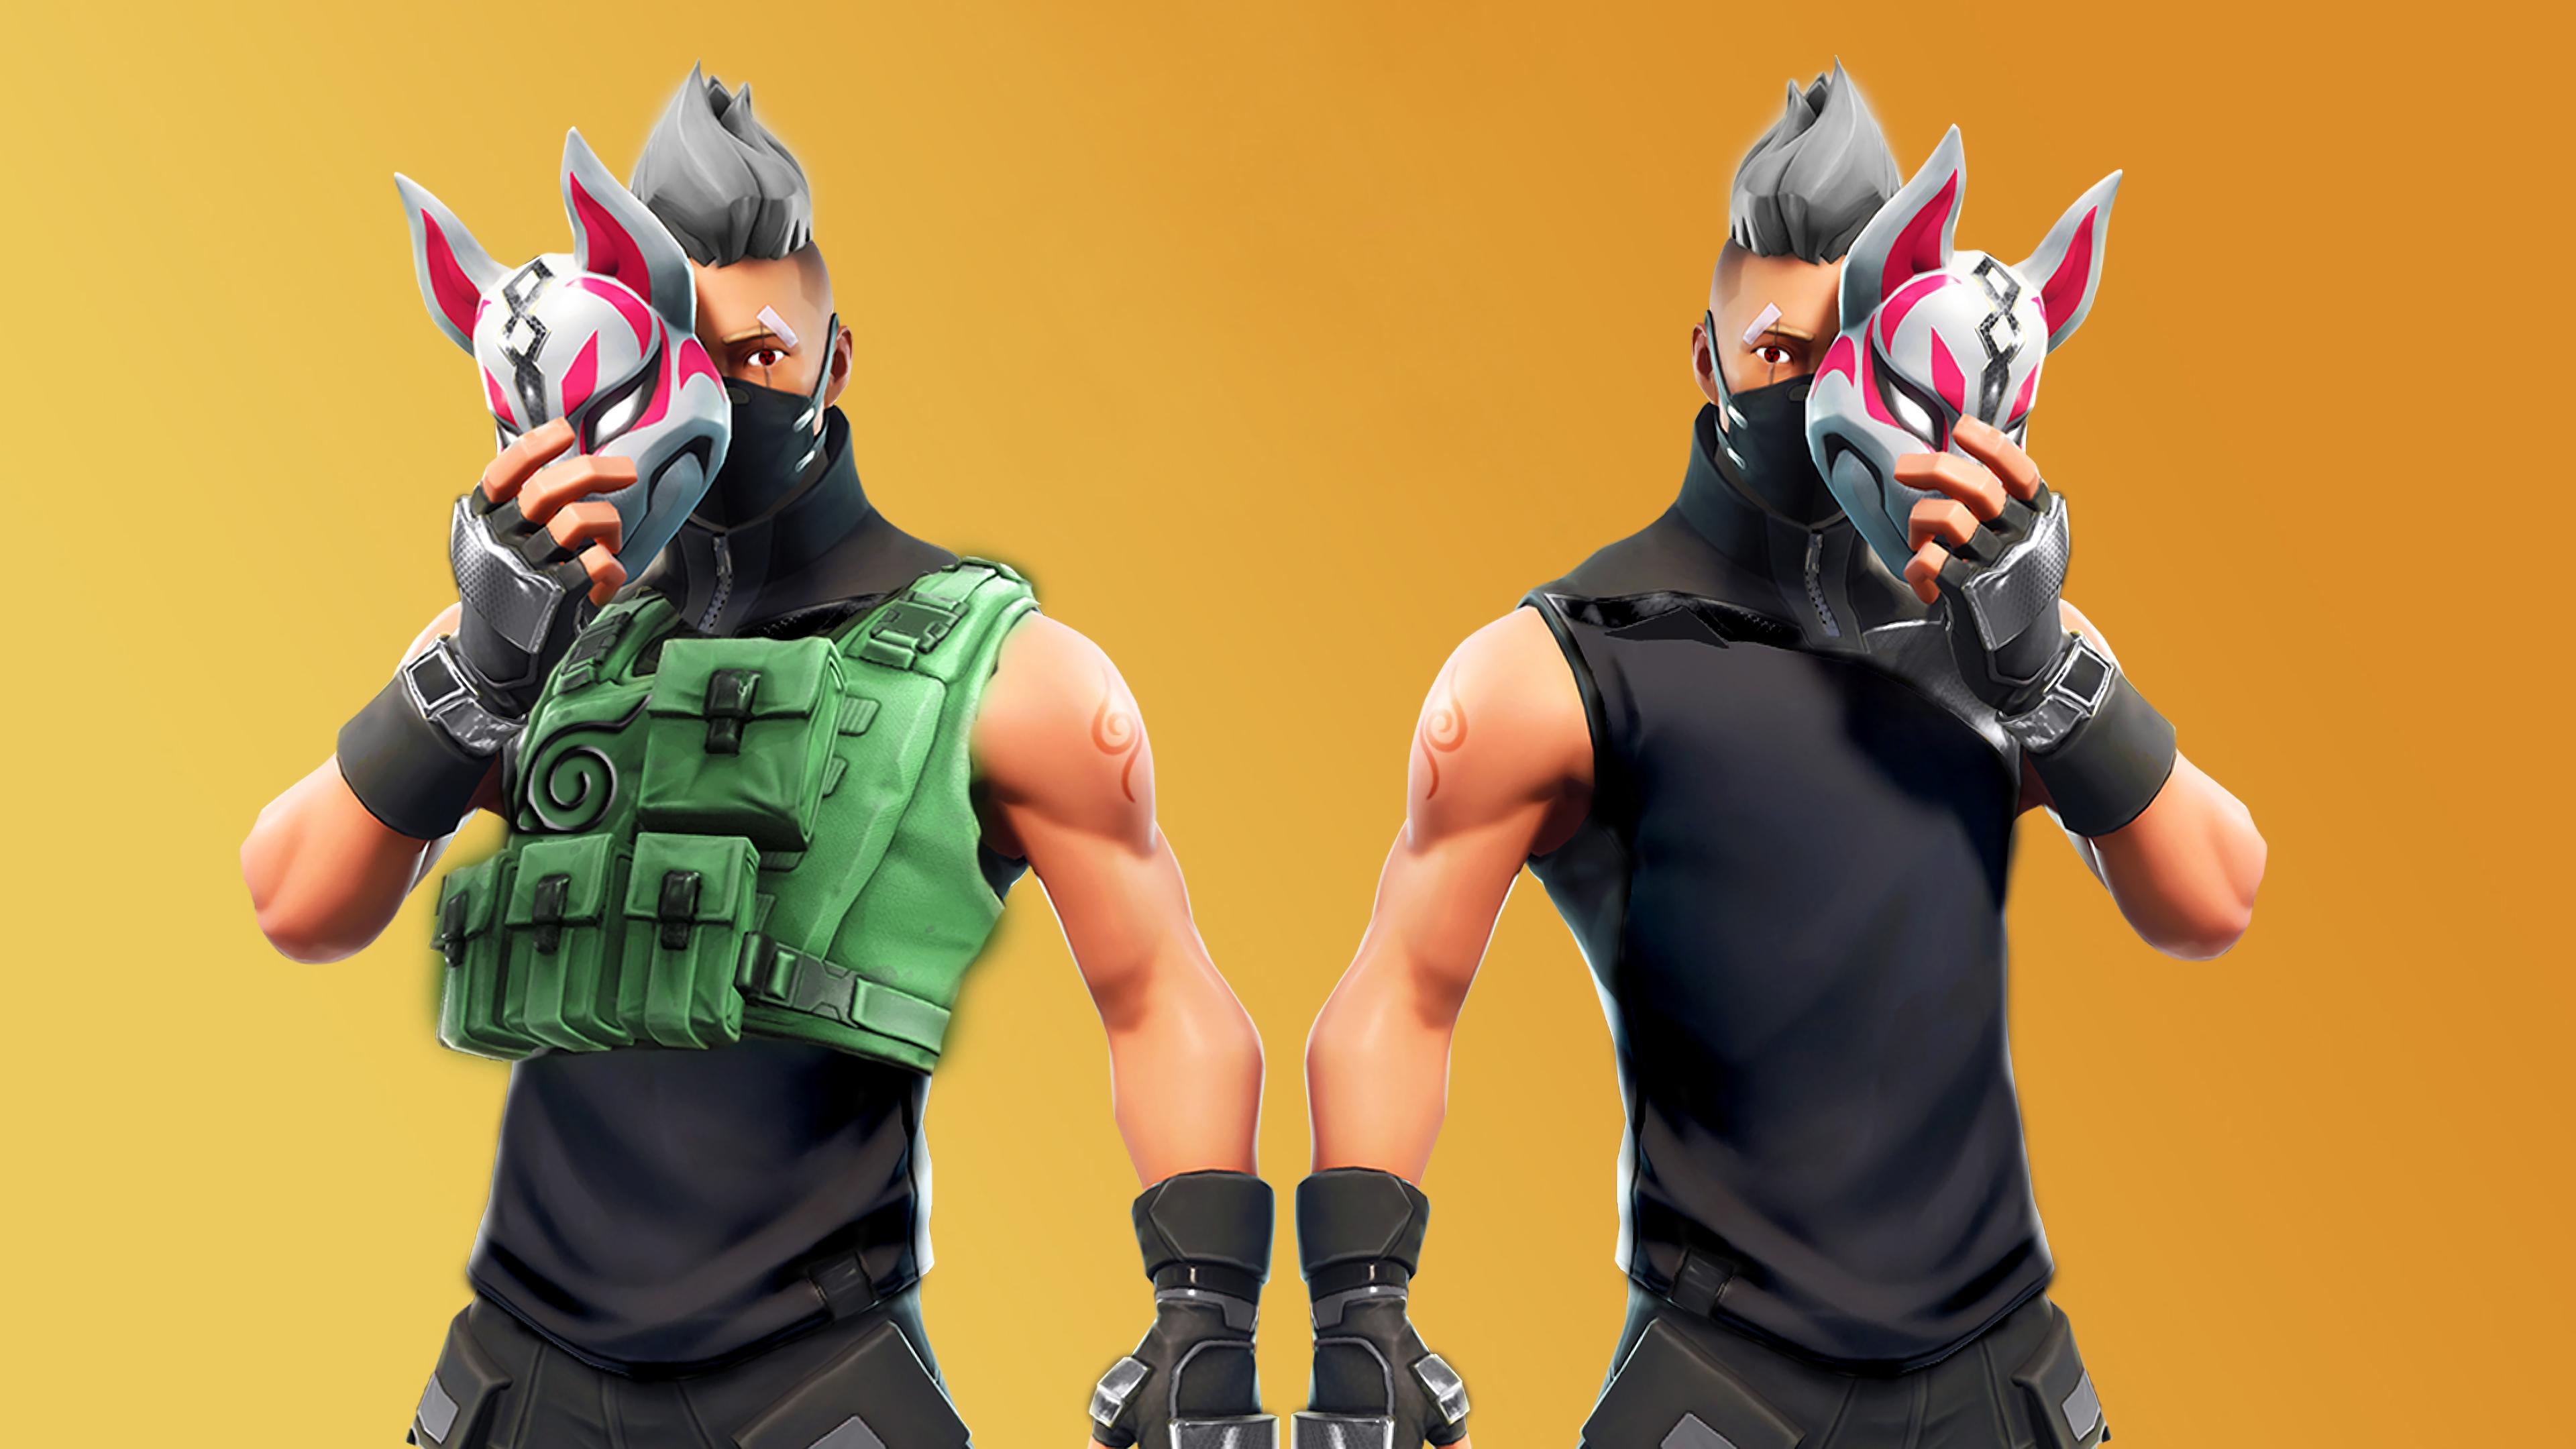 Kitsune Mask Fortnite Battle Royale Drift 4028 Wallpapers and 3840x2160